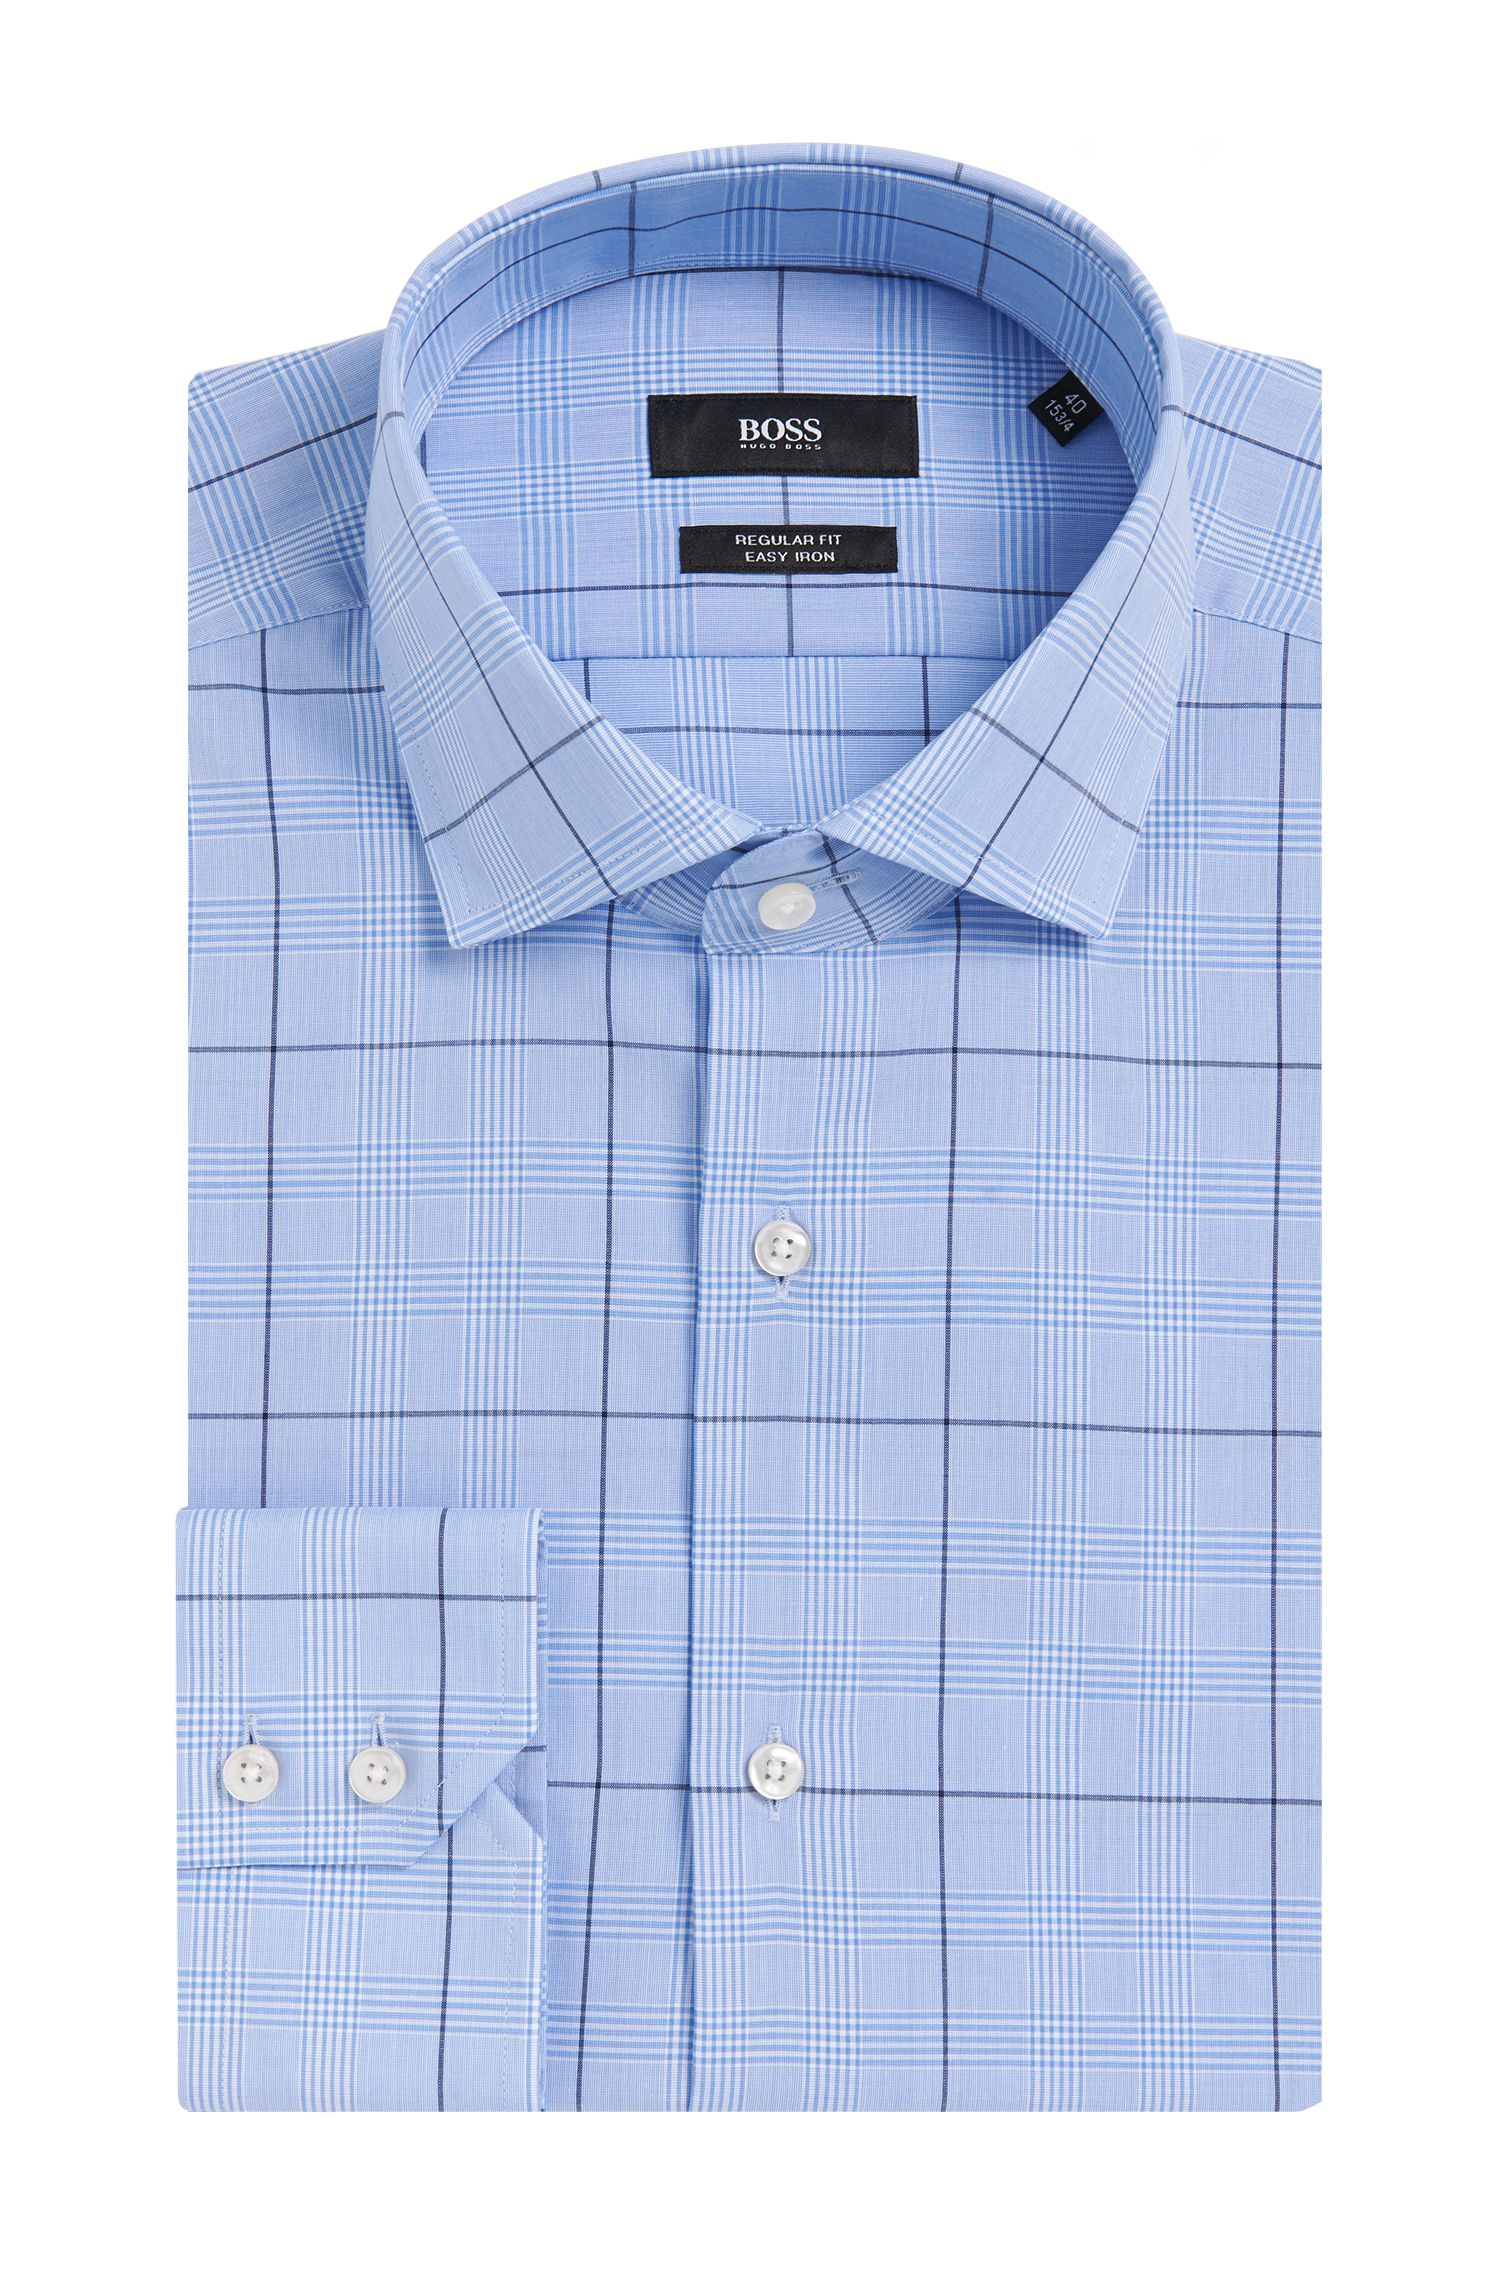 Easy Iron Cotton Dress Shirt, Regular Fit | Gordon